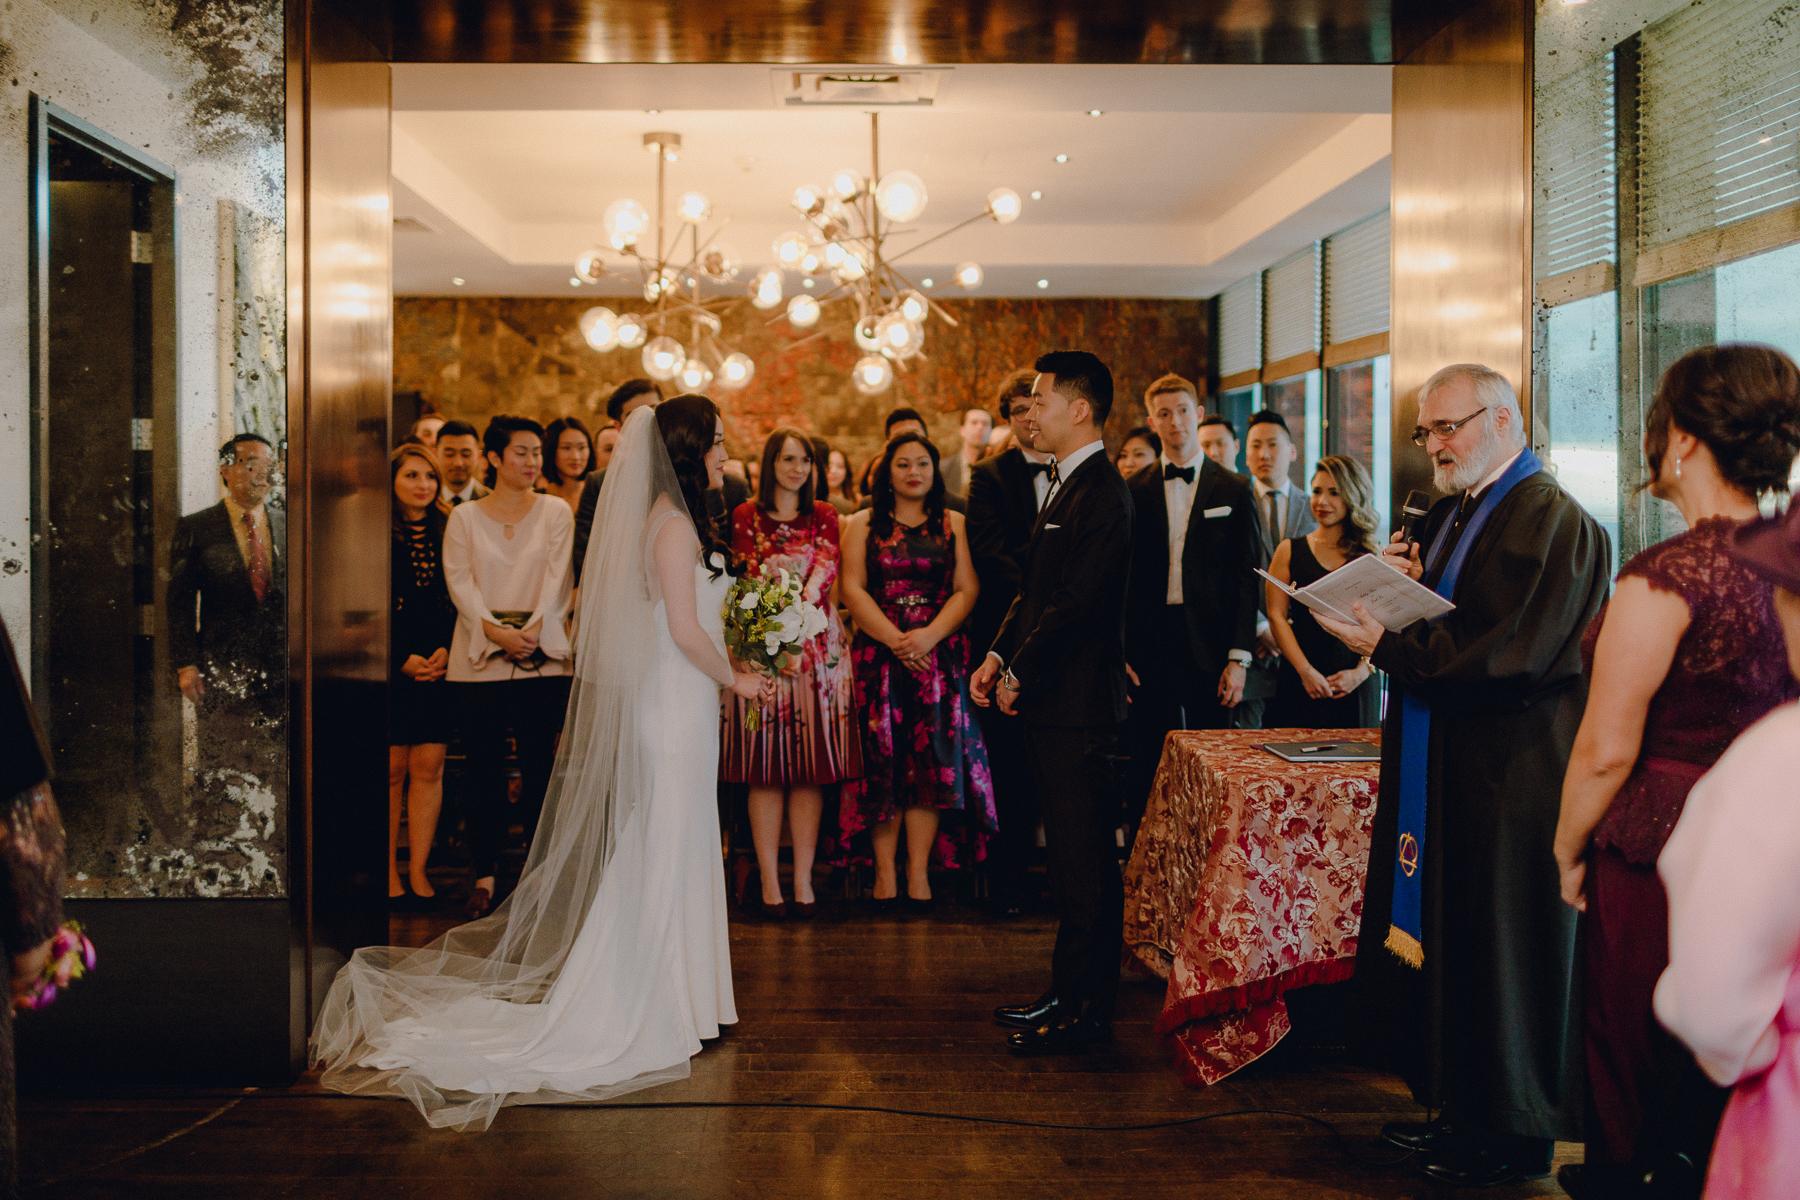 cannoe-restaurannt-wedding 0052.jpg